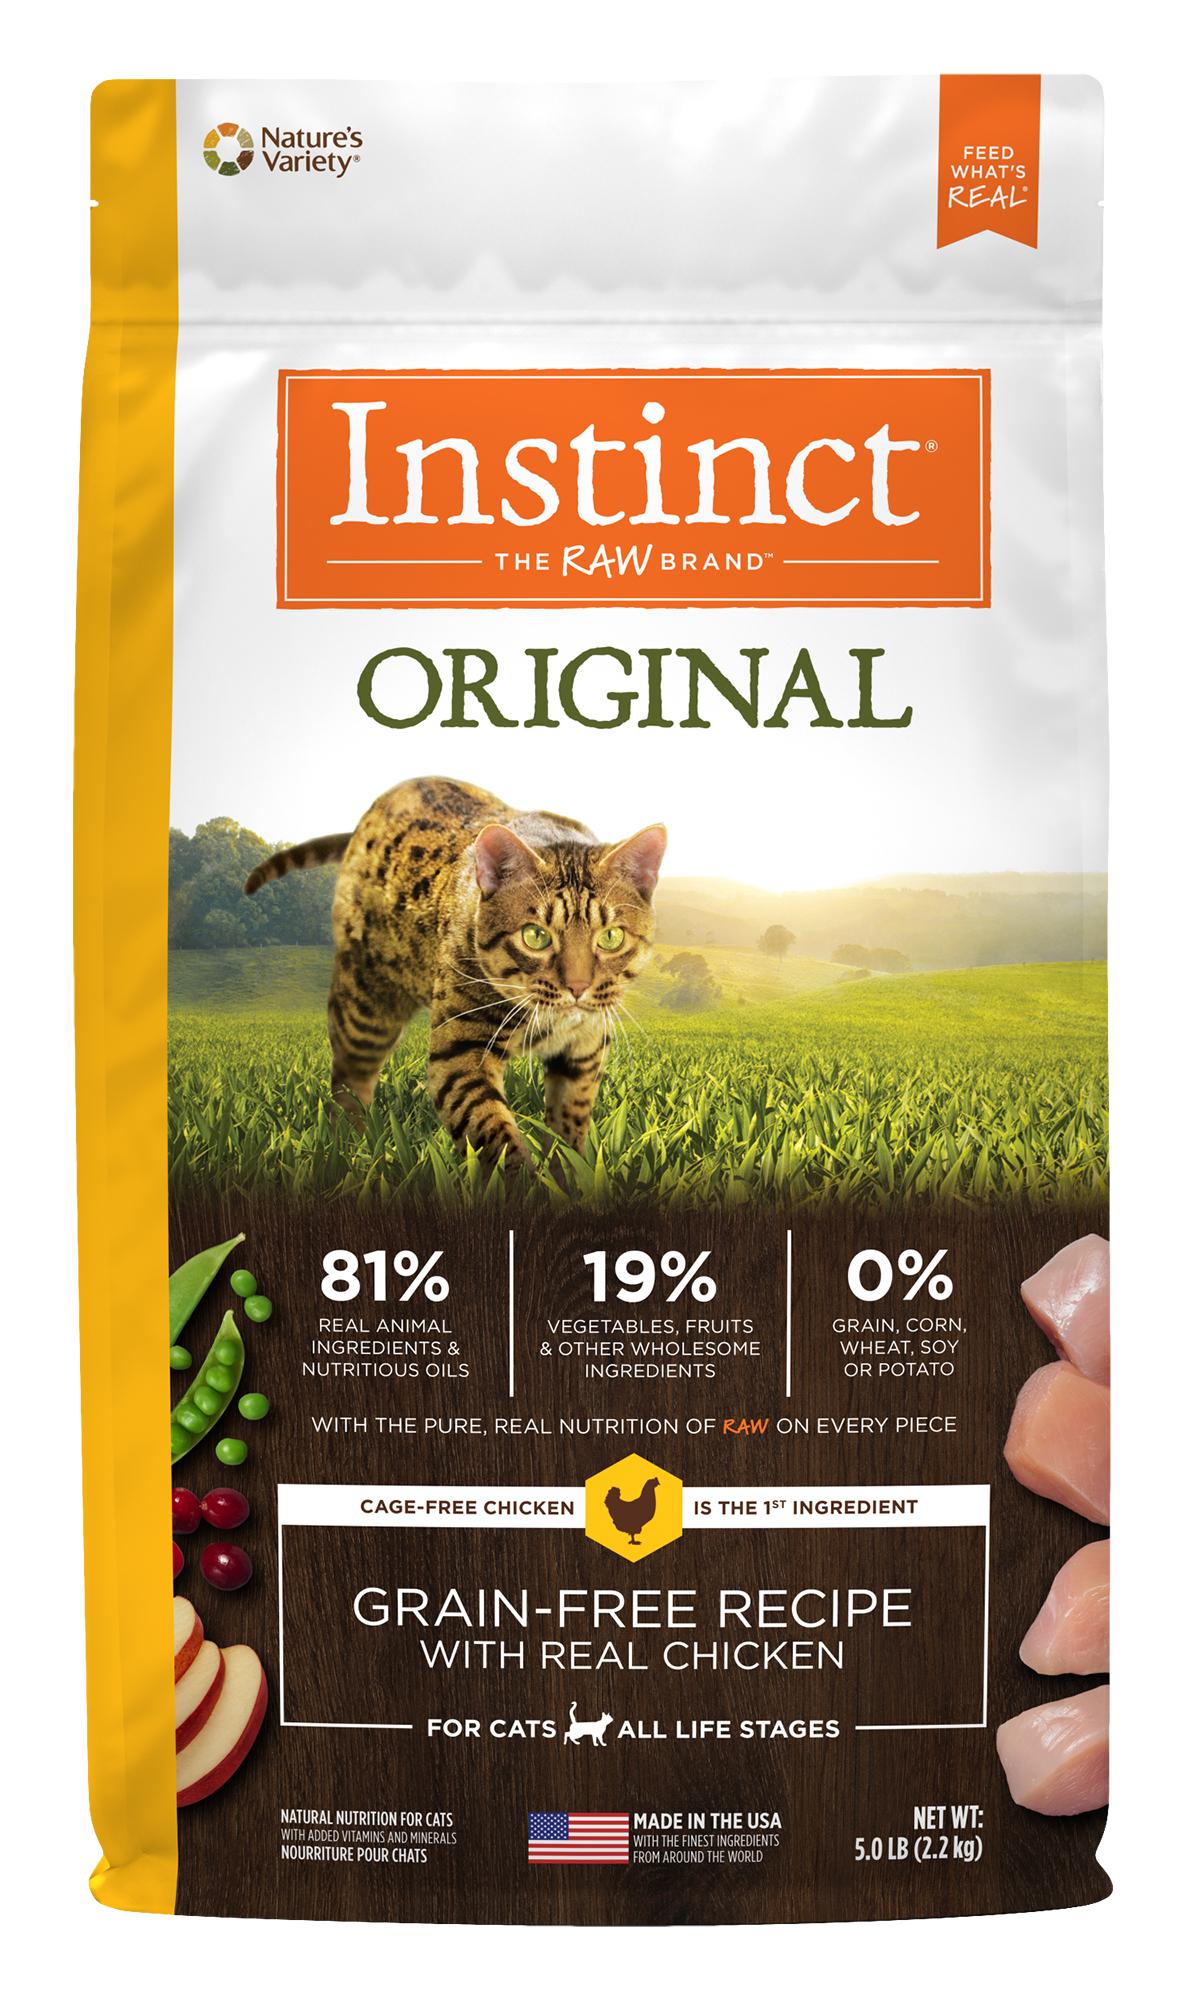 Instinct by Nature's Variety Original Grain-Free Recipe Natural Dry Cat Food, 2.2-lb